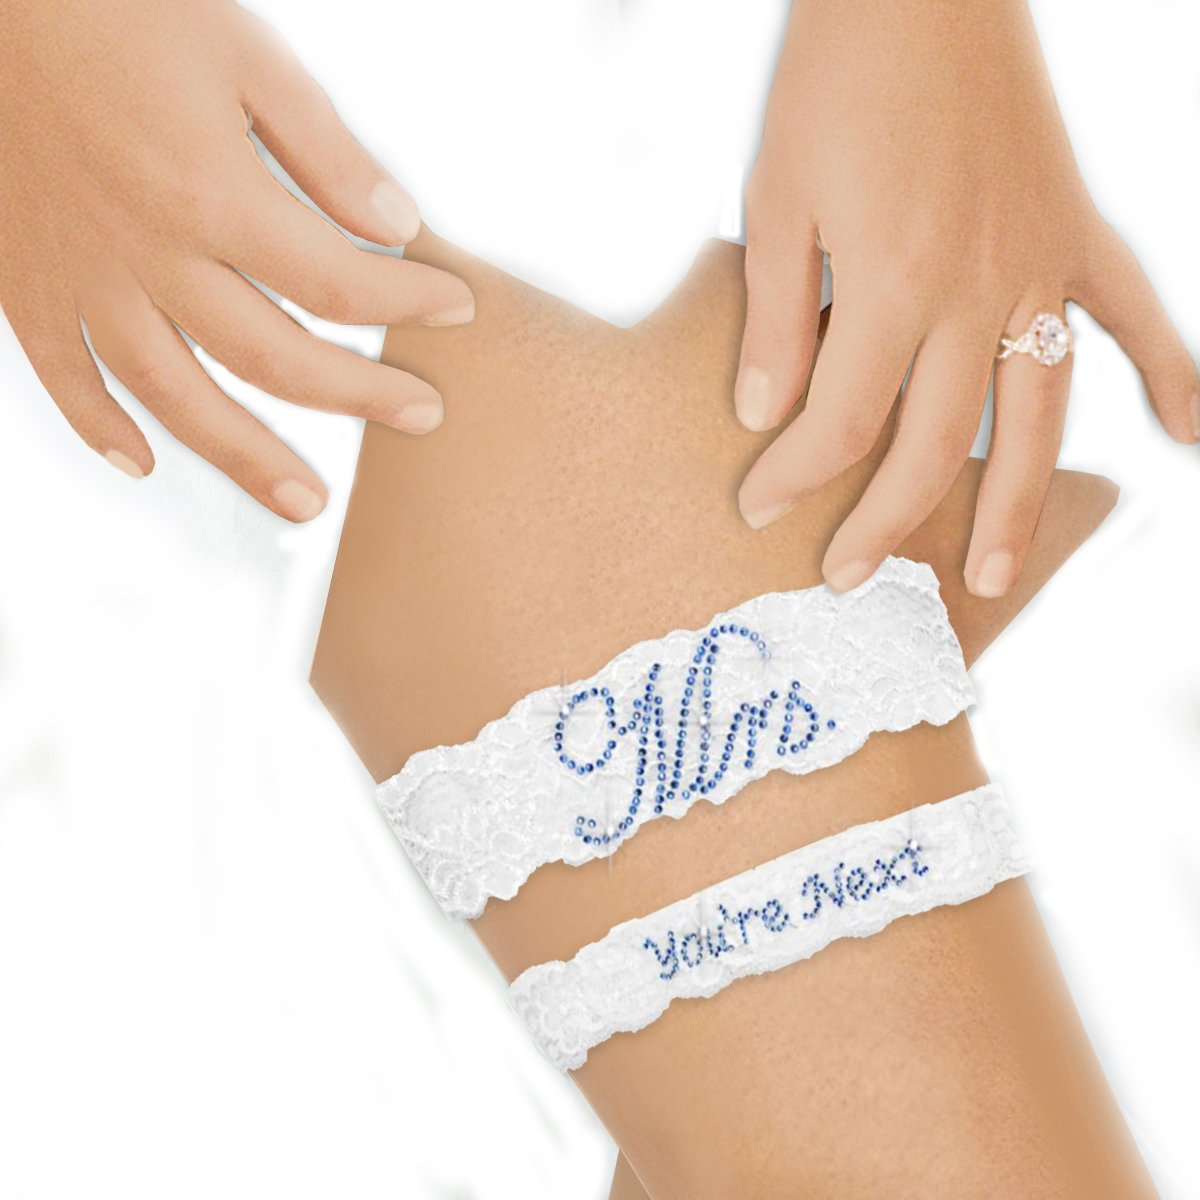 Zynotti Something Blue Bridal Wedding Garter Sets - Mrs. You're Next Garter Set